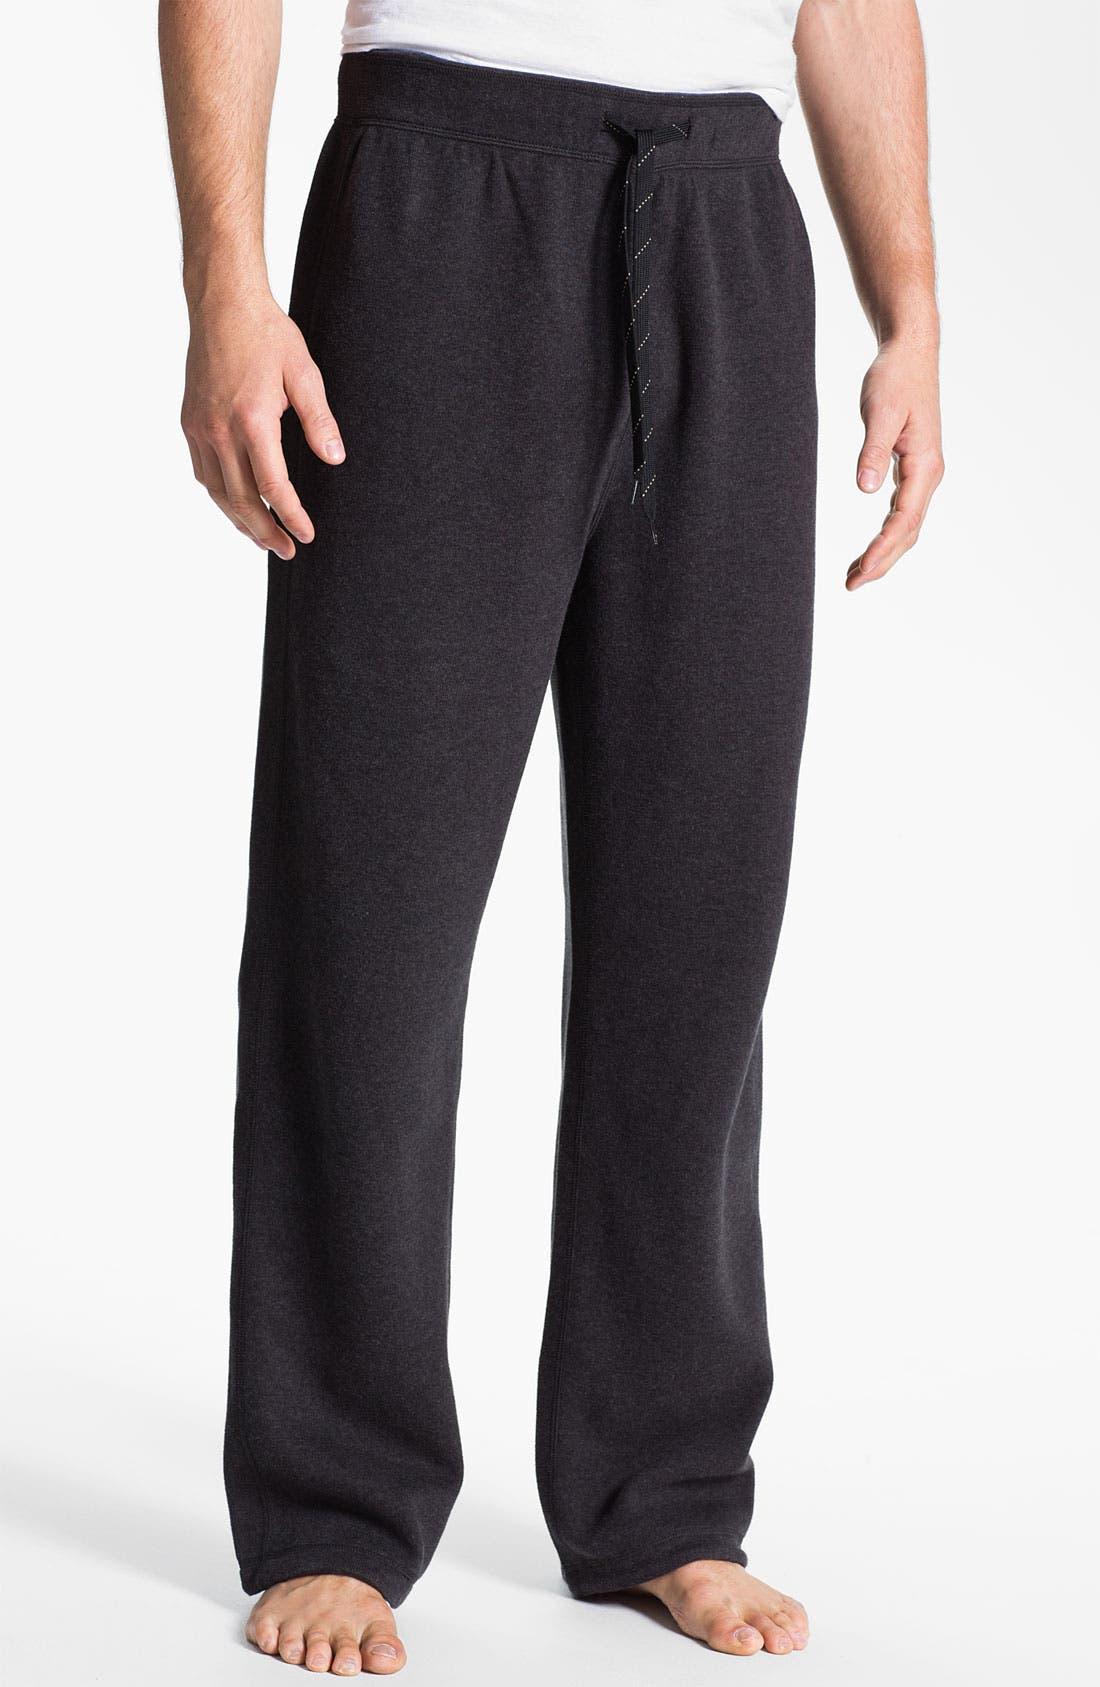 Main Image - Tommy Bahama 'Flipside Pro' Reversible Knit Pants